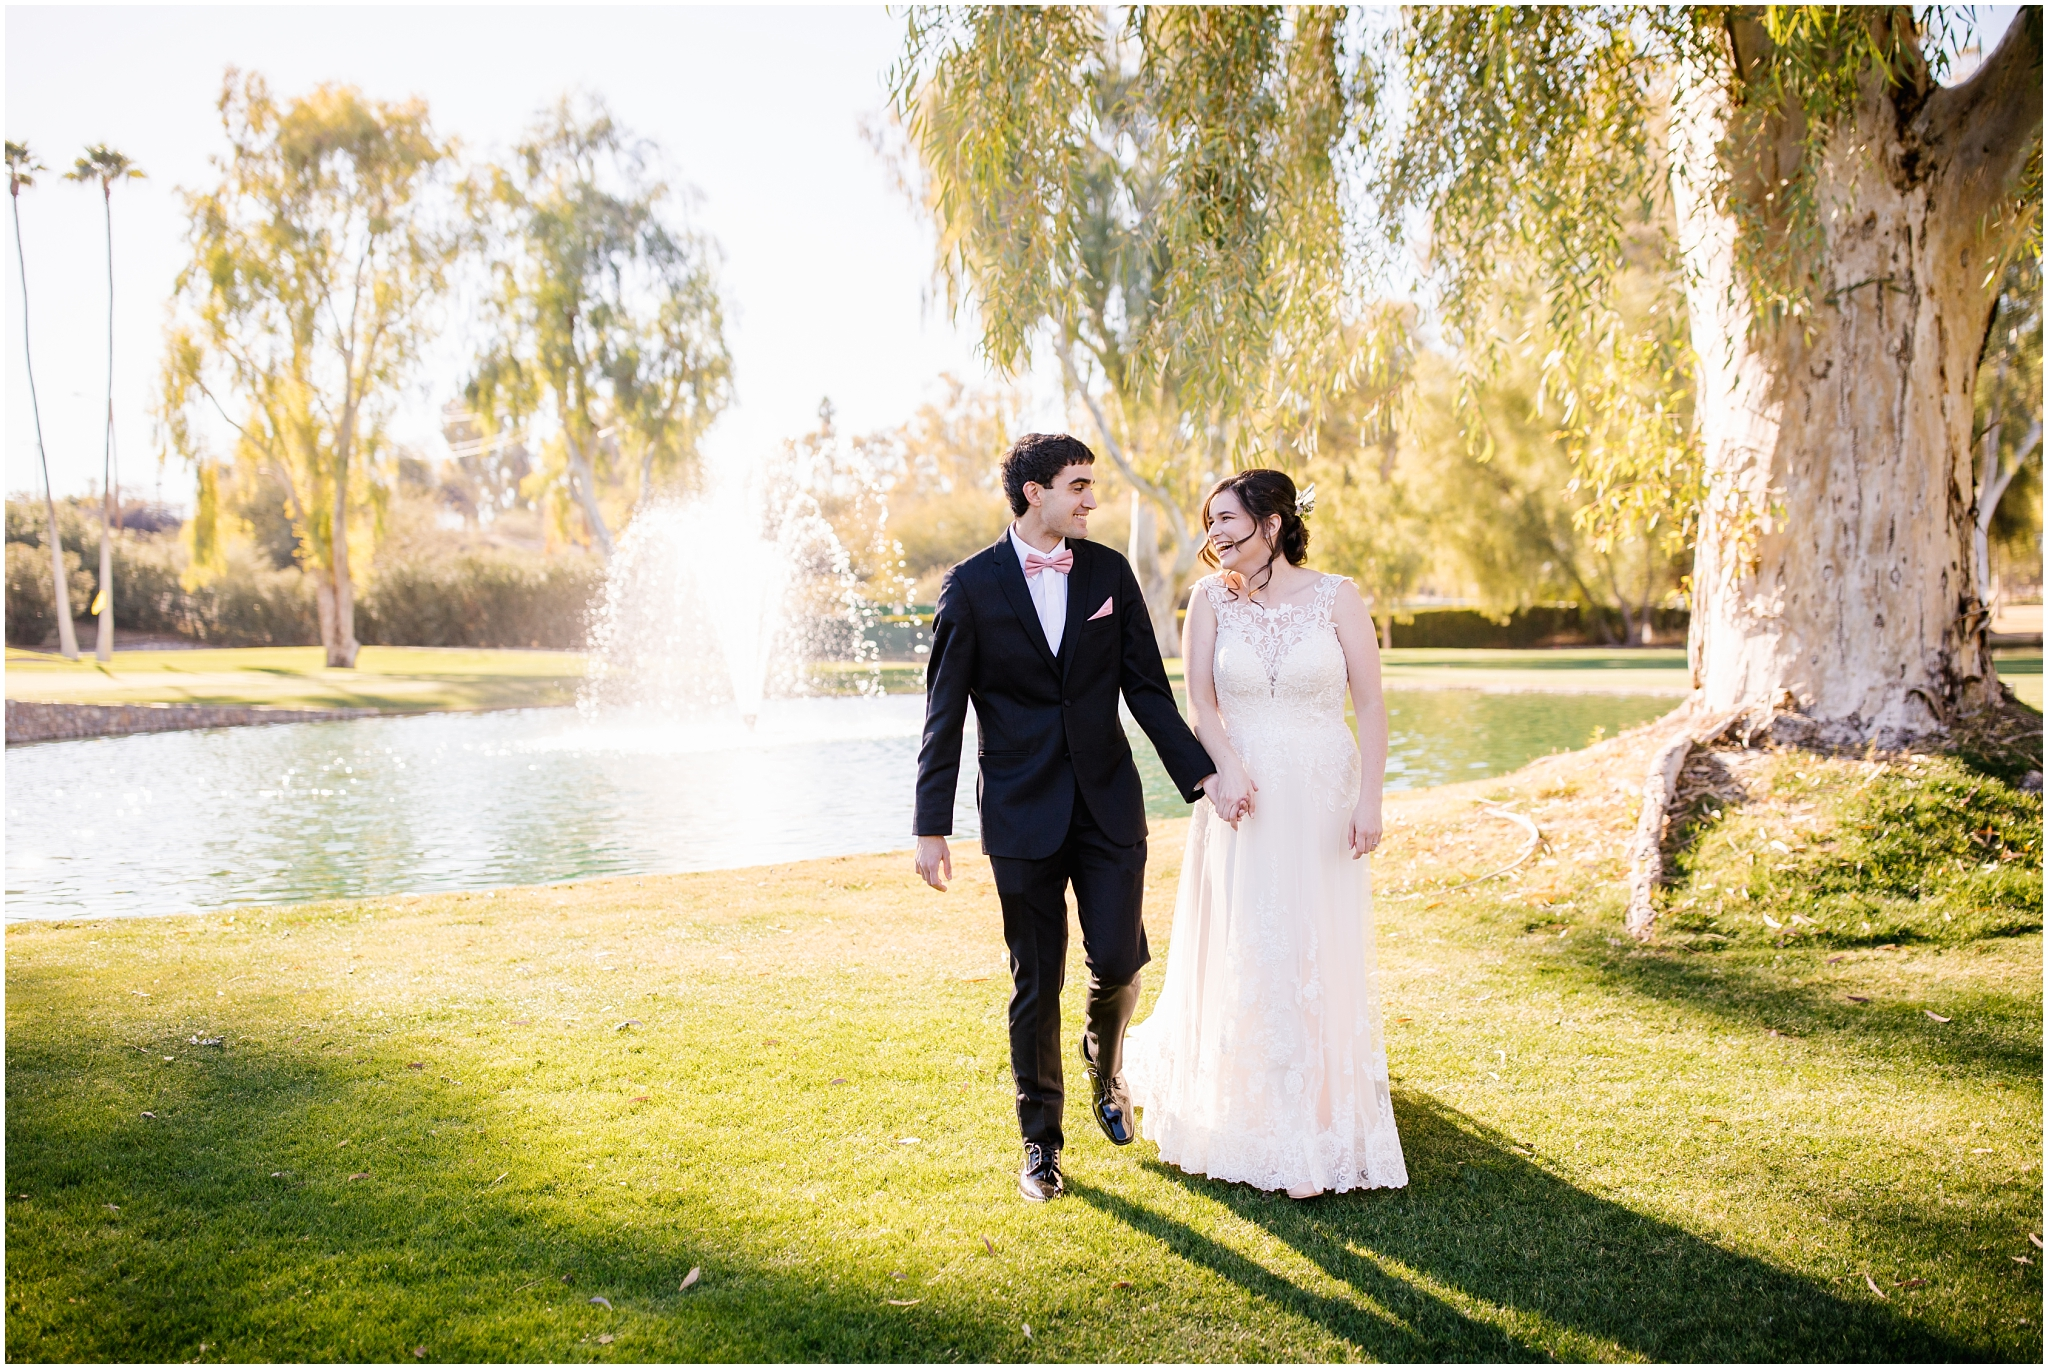 Marissa Nathan-4print_Lizzie-B-Imagery-Arizona-Wedding-Photographer-Salt-Lake-City-Temple-Park-City-Phoenix-Mesa-County-Club.jpg